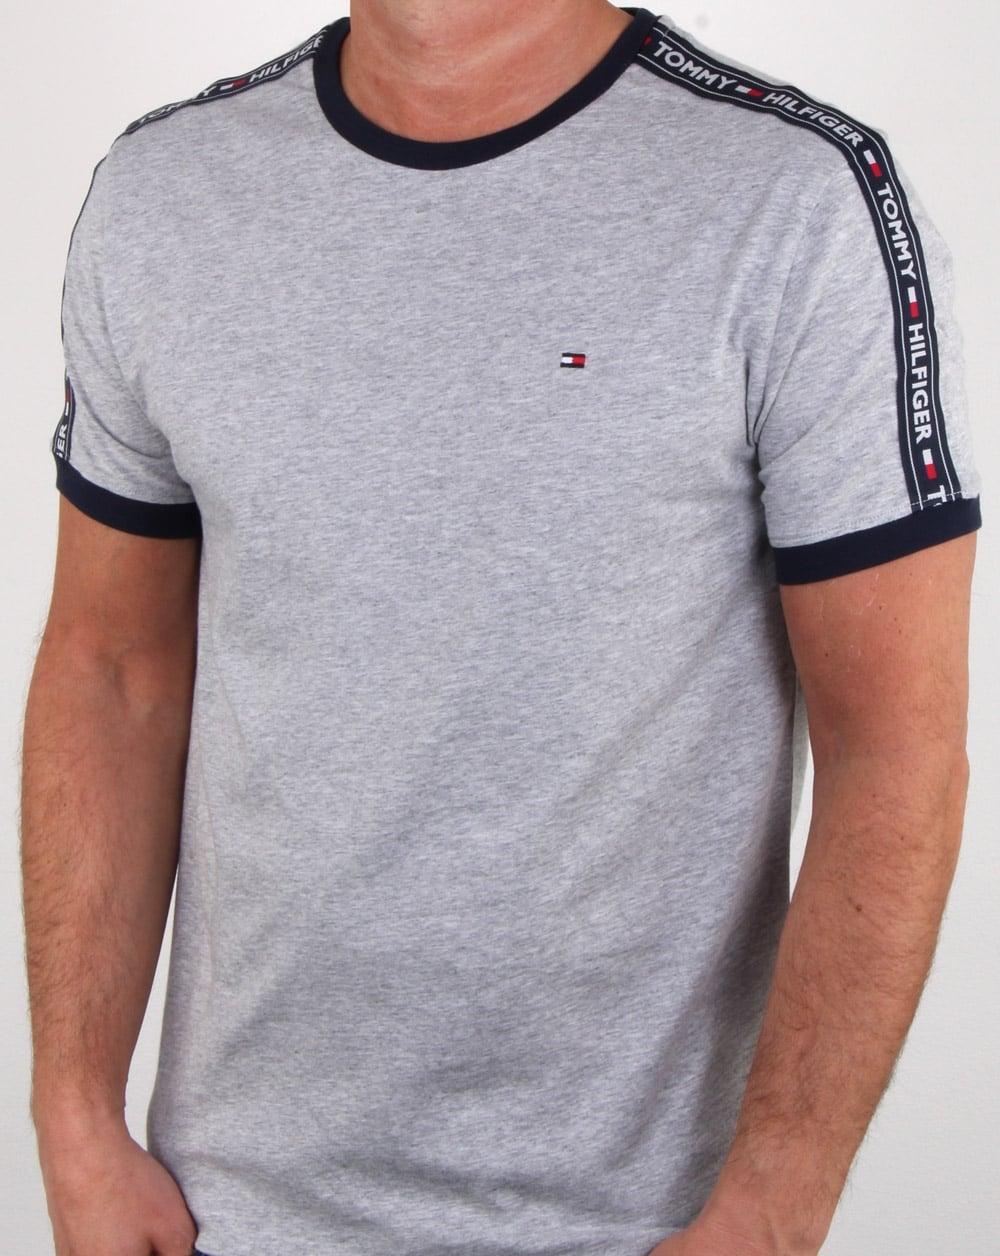 Tommy Hilfiger Boys' T Shirt Heather Grau: Amazon.co.uk